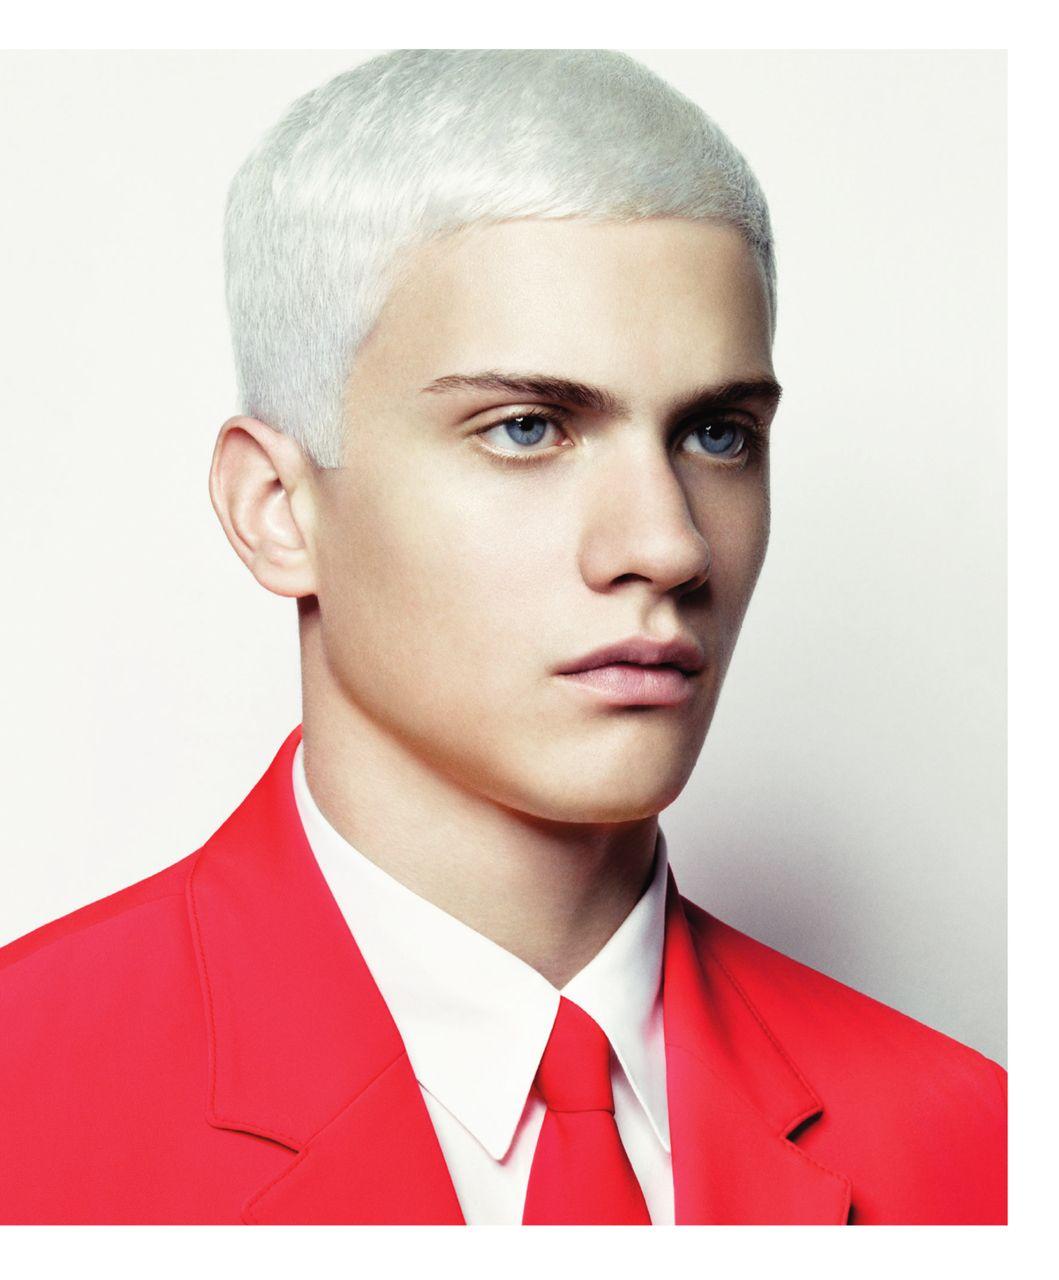 Man #White #Hair  Mens hairstyles, Hair and beard styles